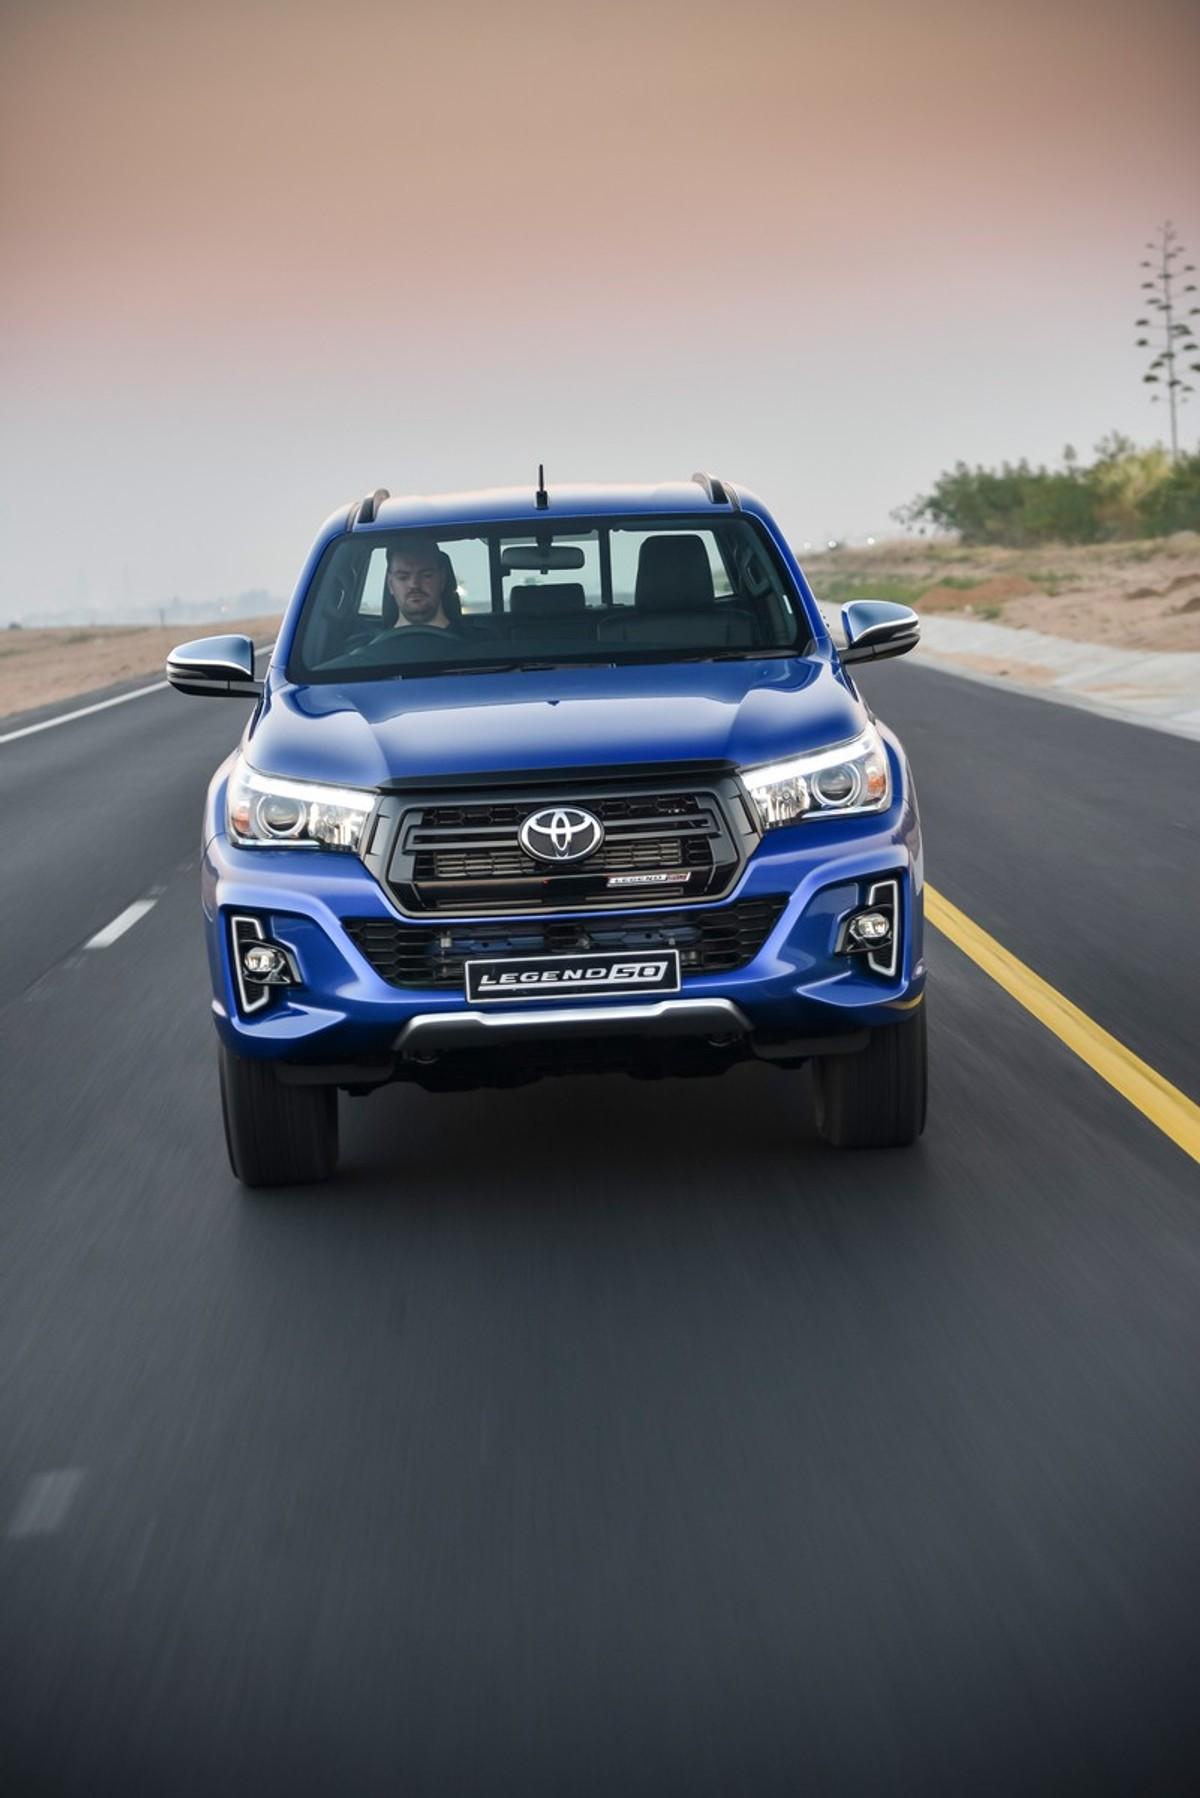 Legend Auto Body >> Toyota Hilux Legend 50 (2019) Specs & Price - Cars.co.za